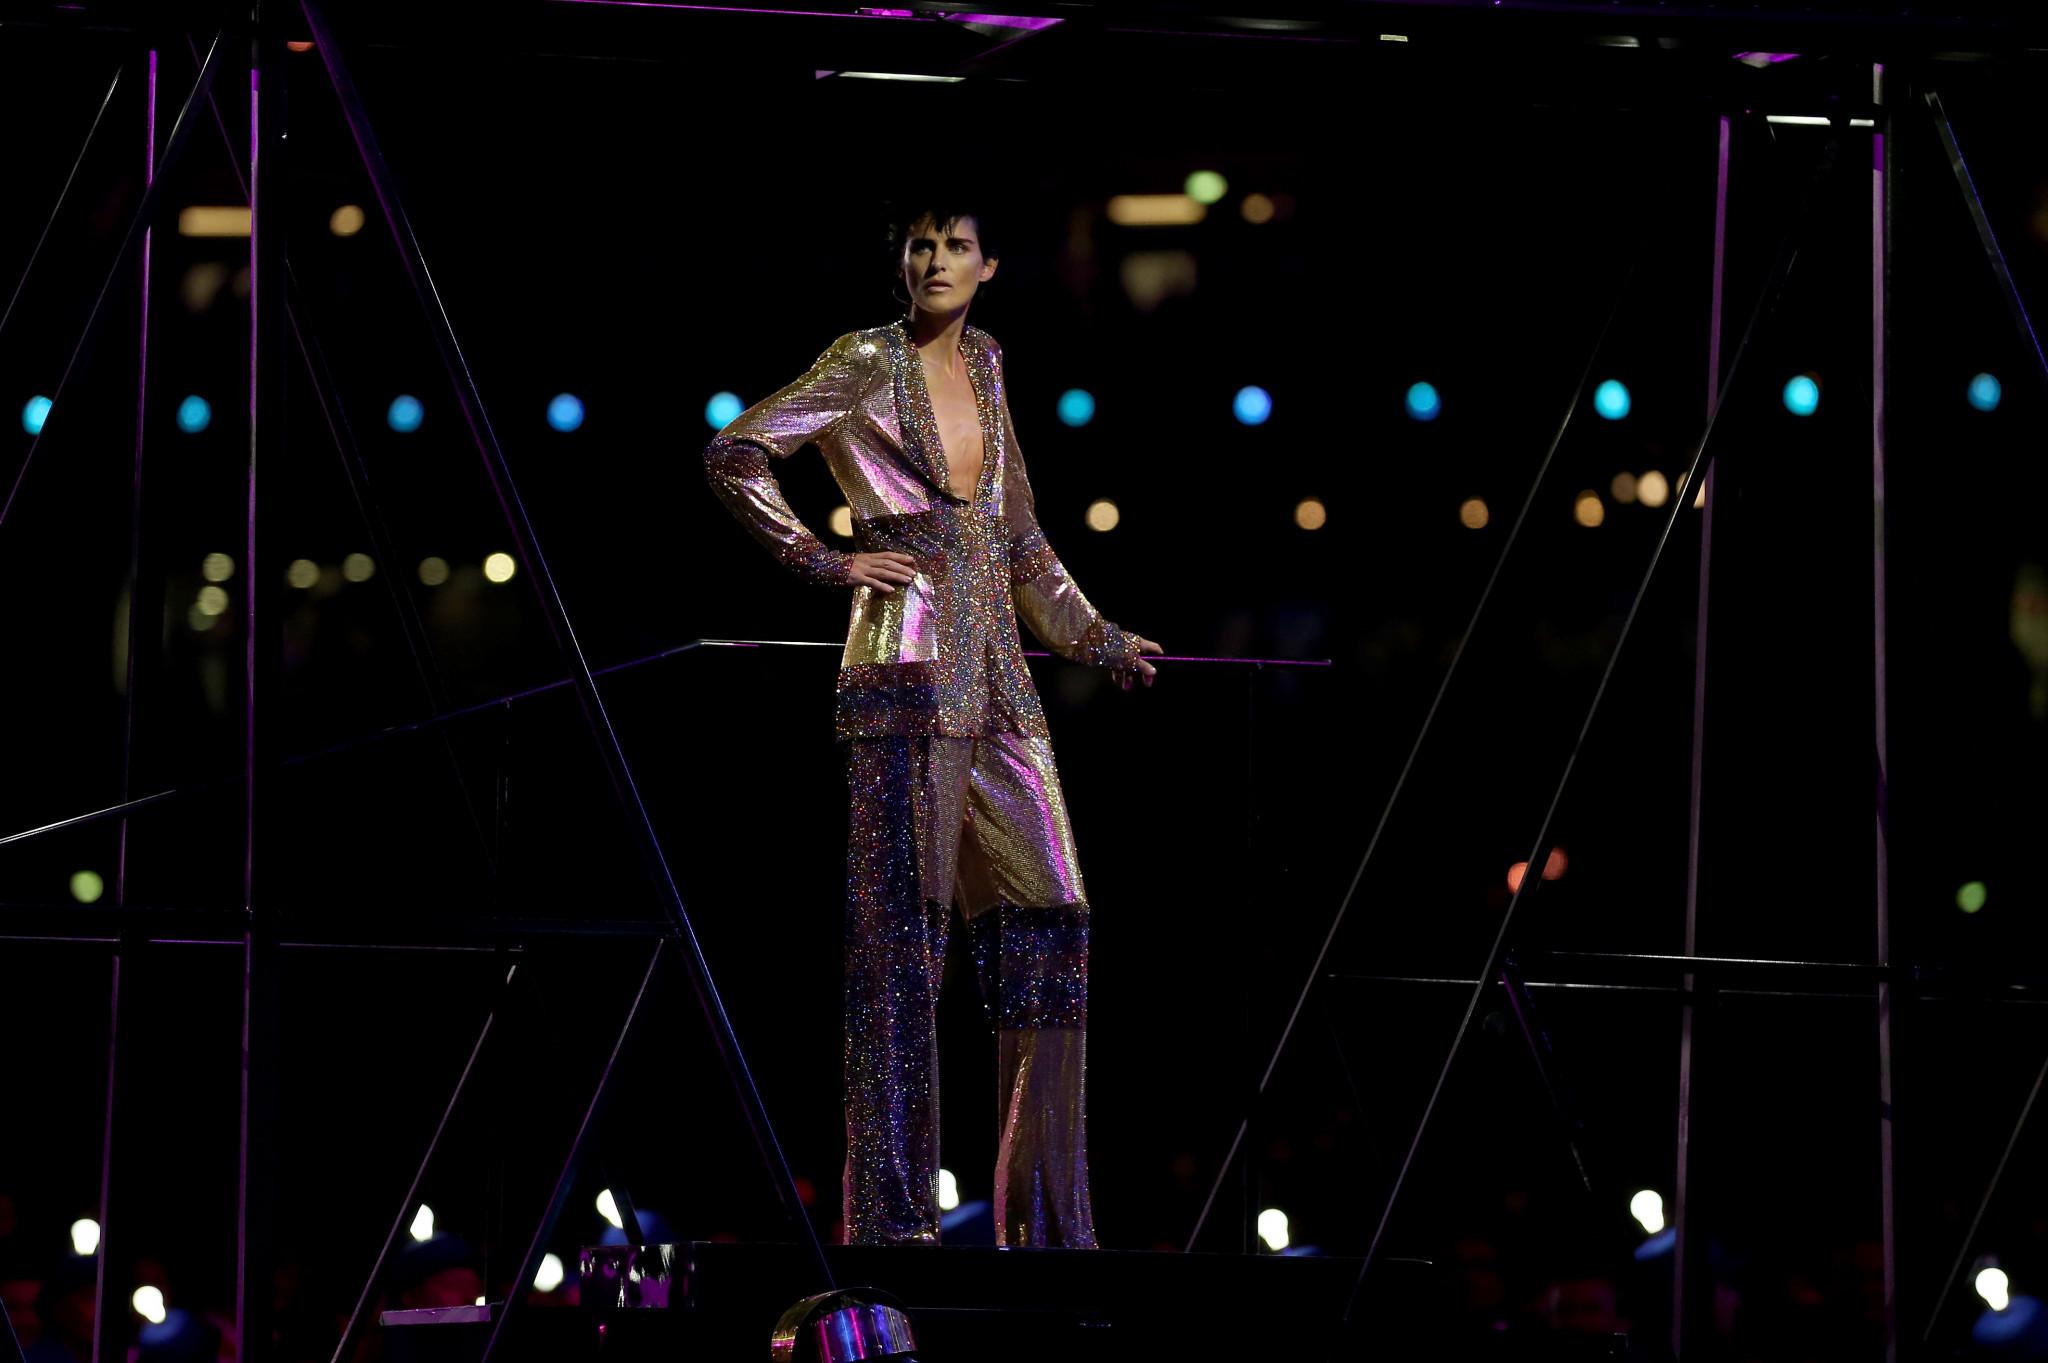 Supermodel Stella Tennant, who strode London 2012 Closing Ceremony catwalk, dies aged 50